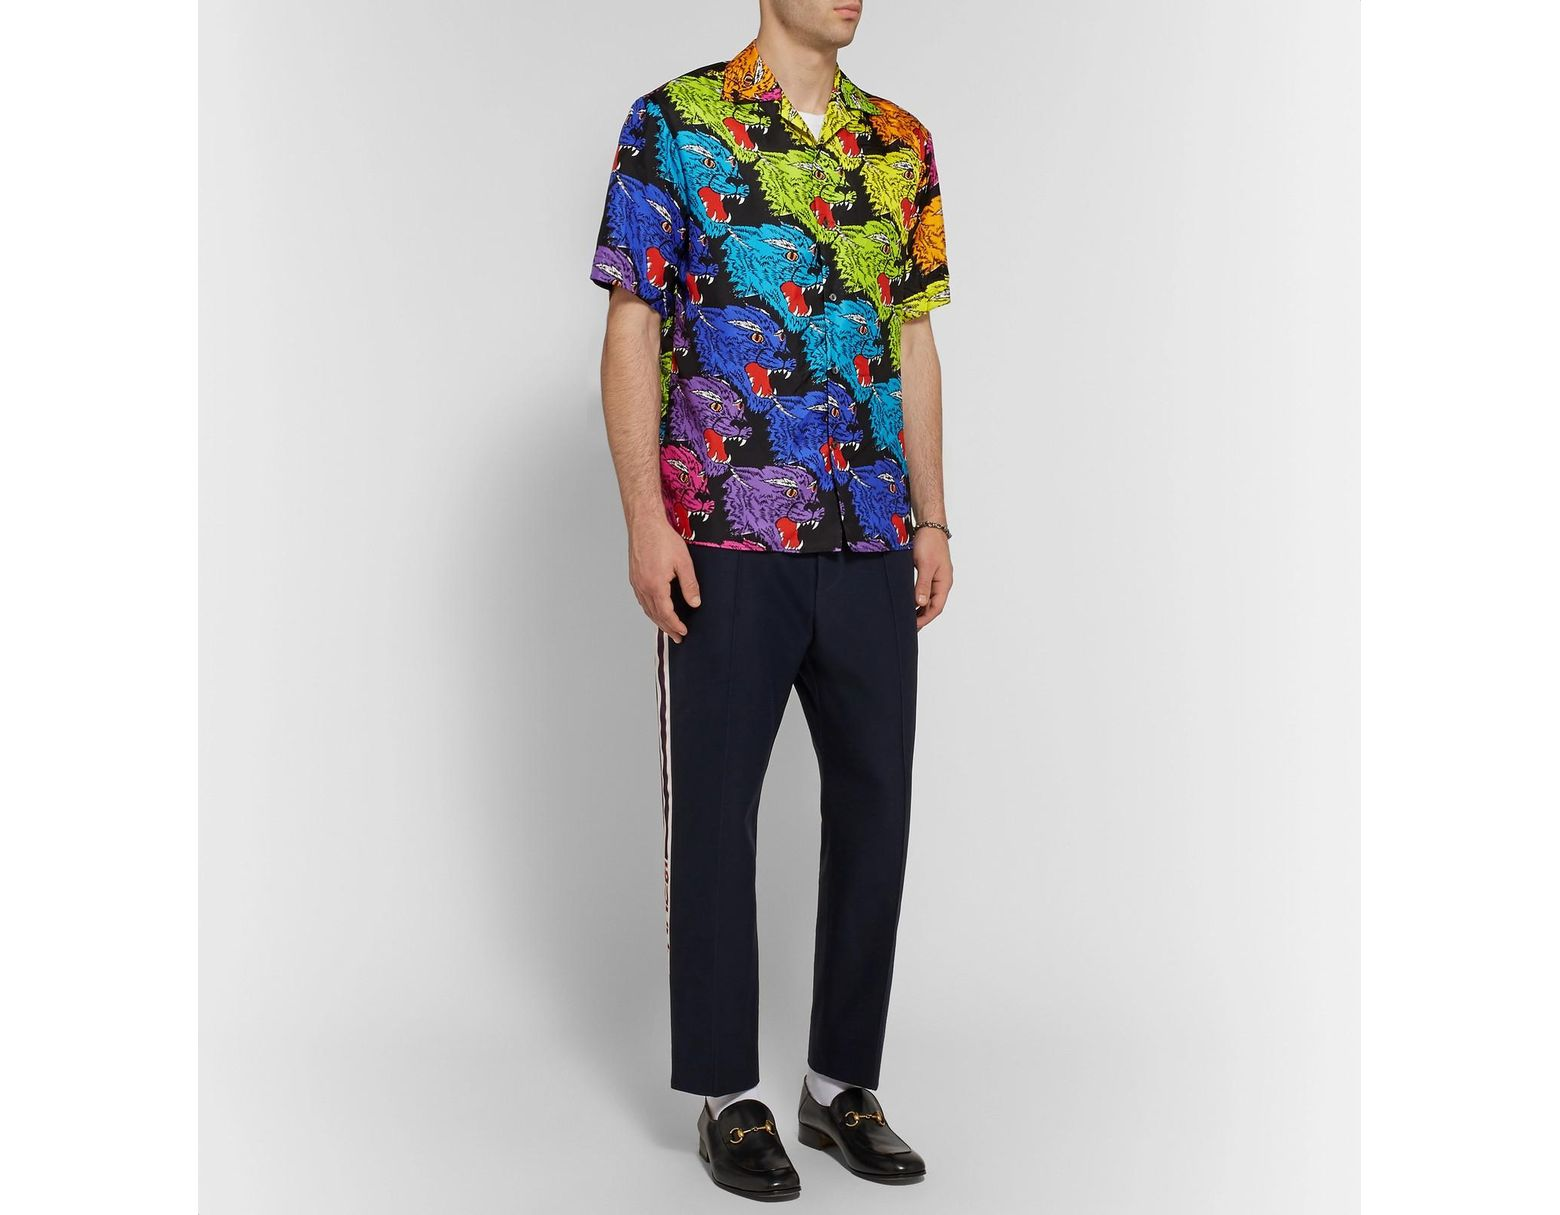 daf534796 Gucci Camp-collar Printed Silk-twill Shirt in Green for Men - Lyst